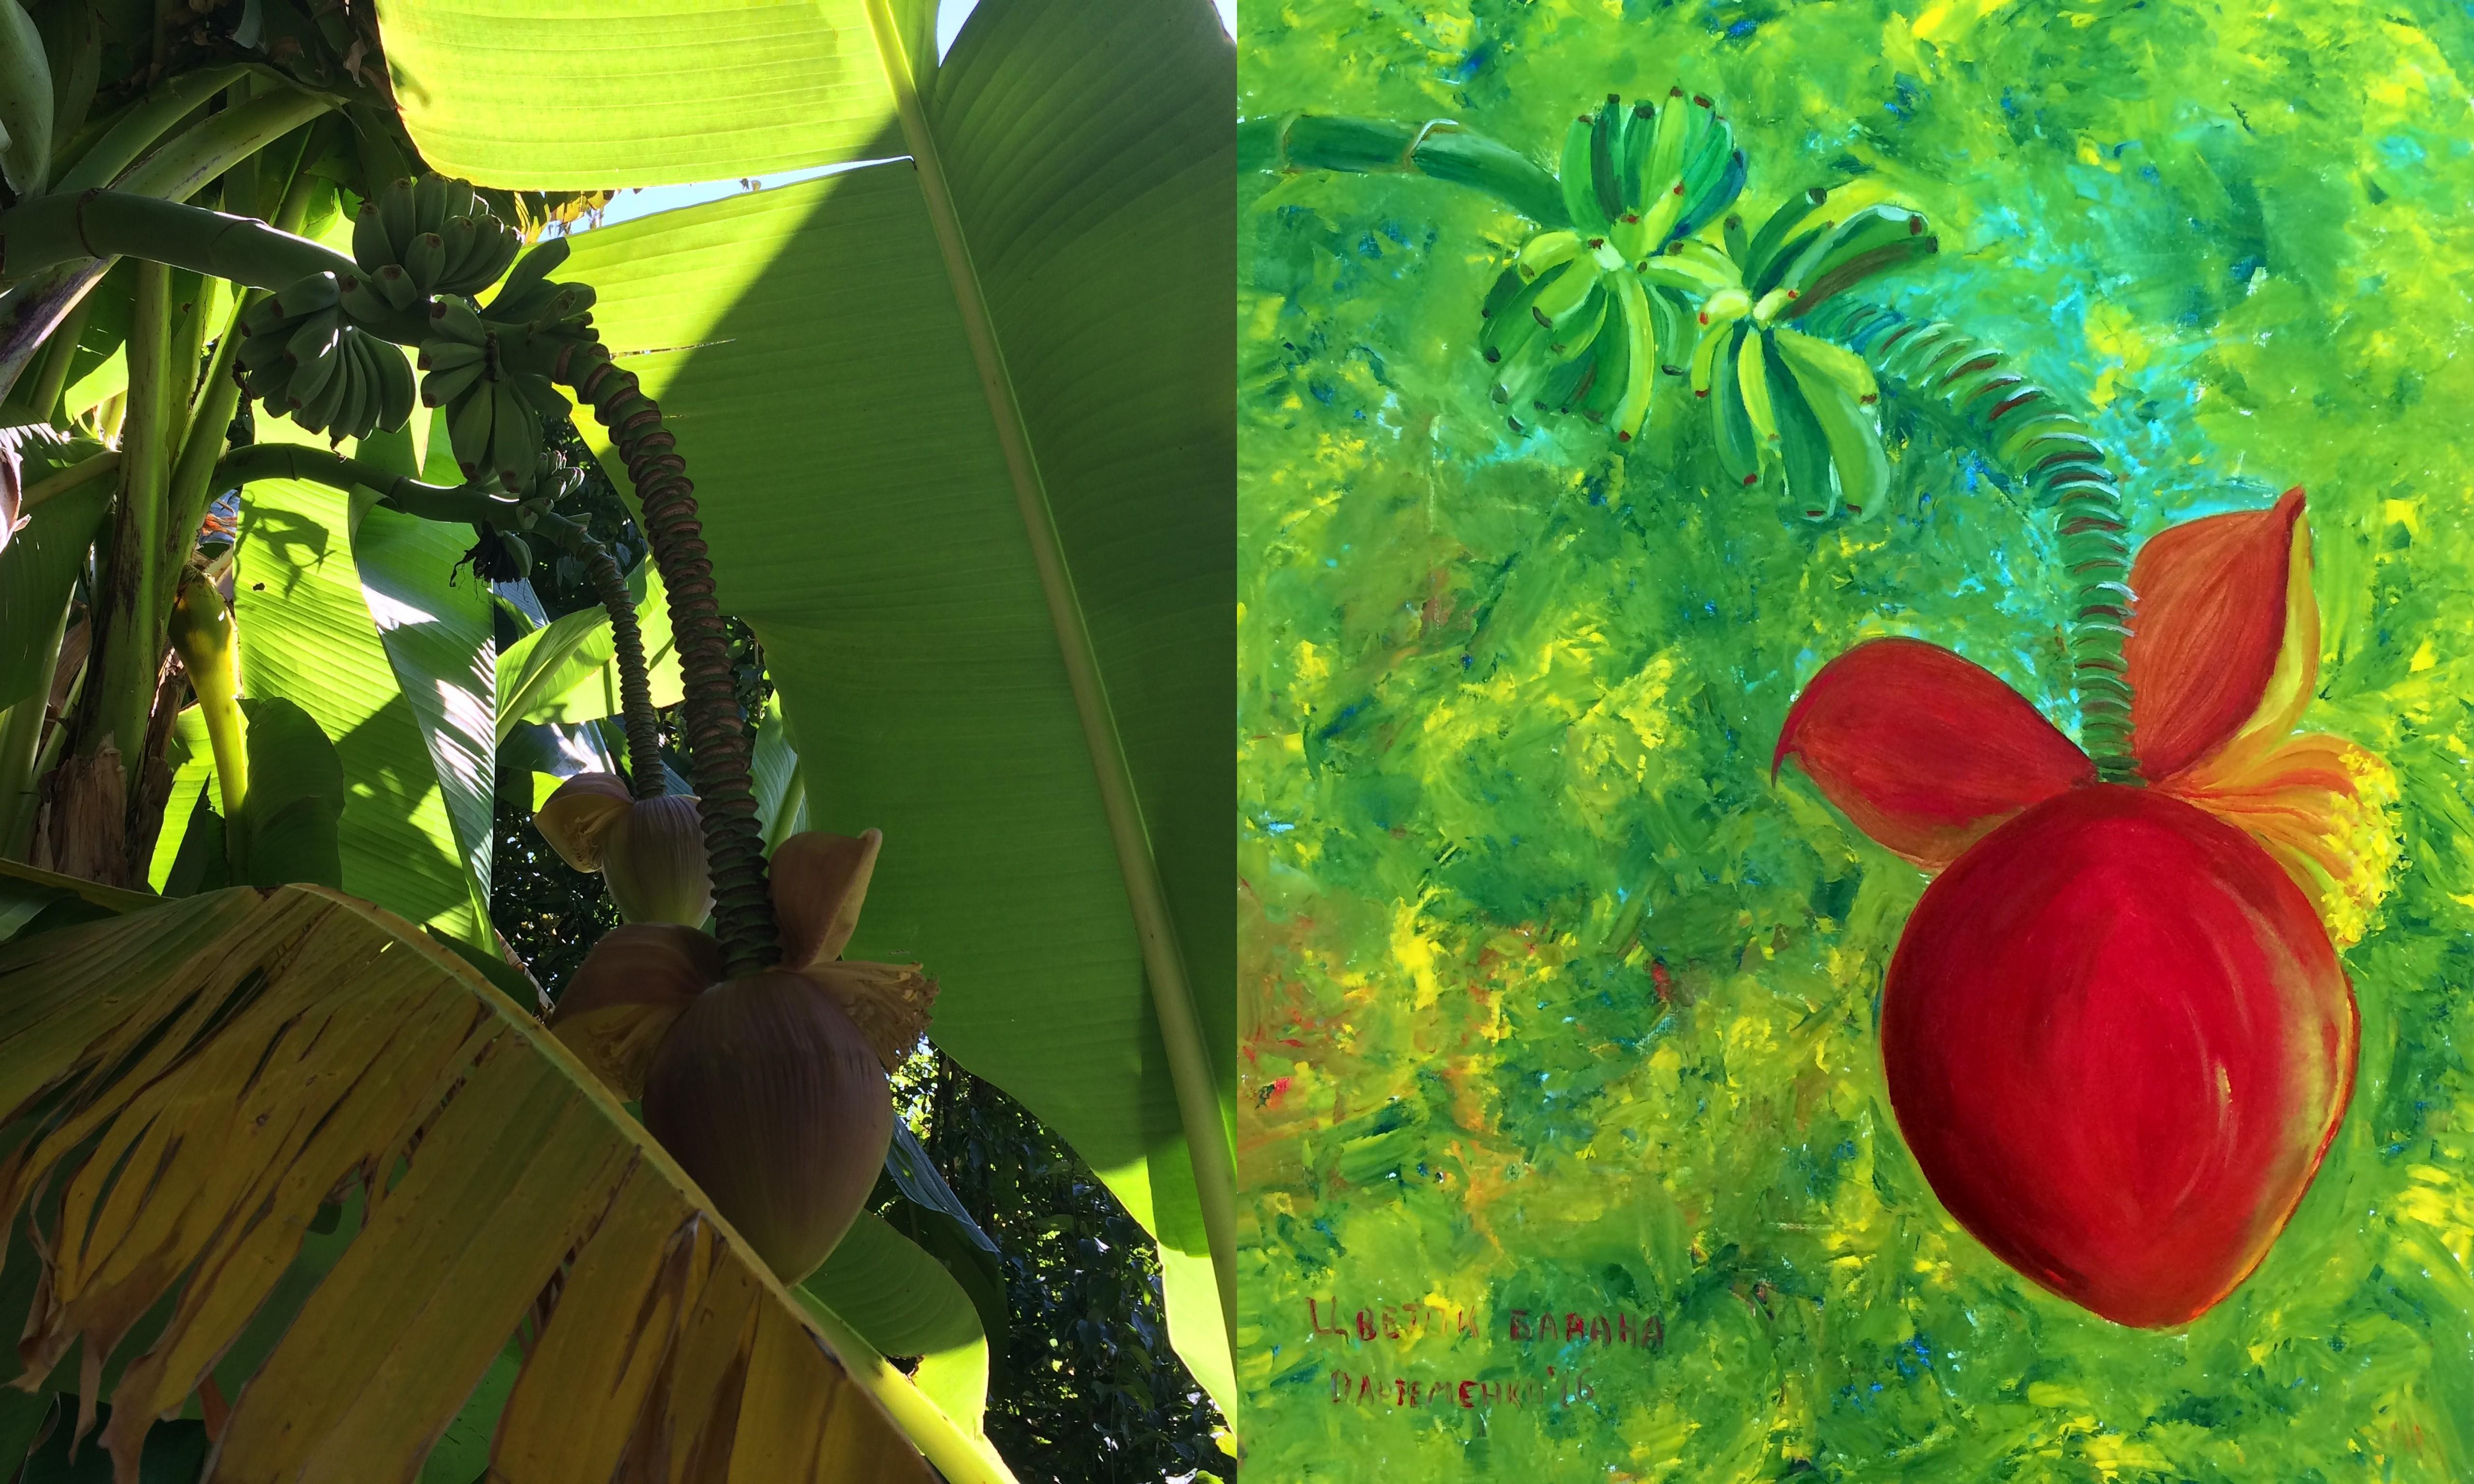 банан цветет